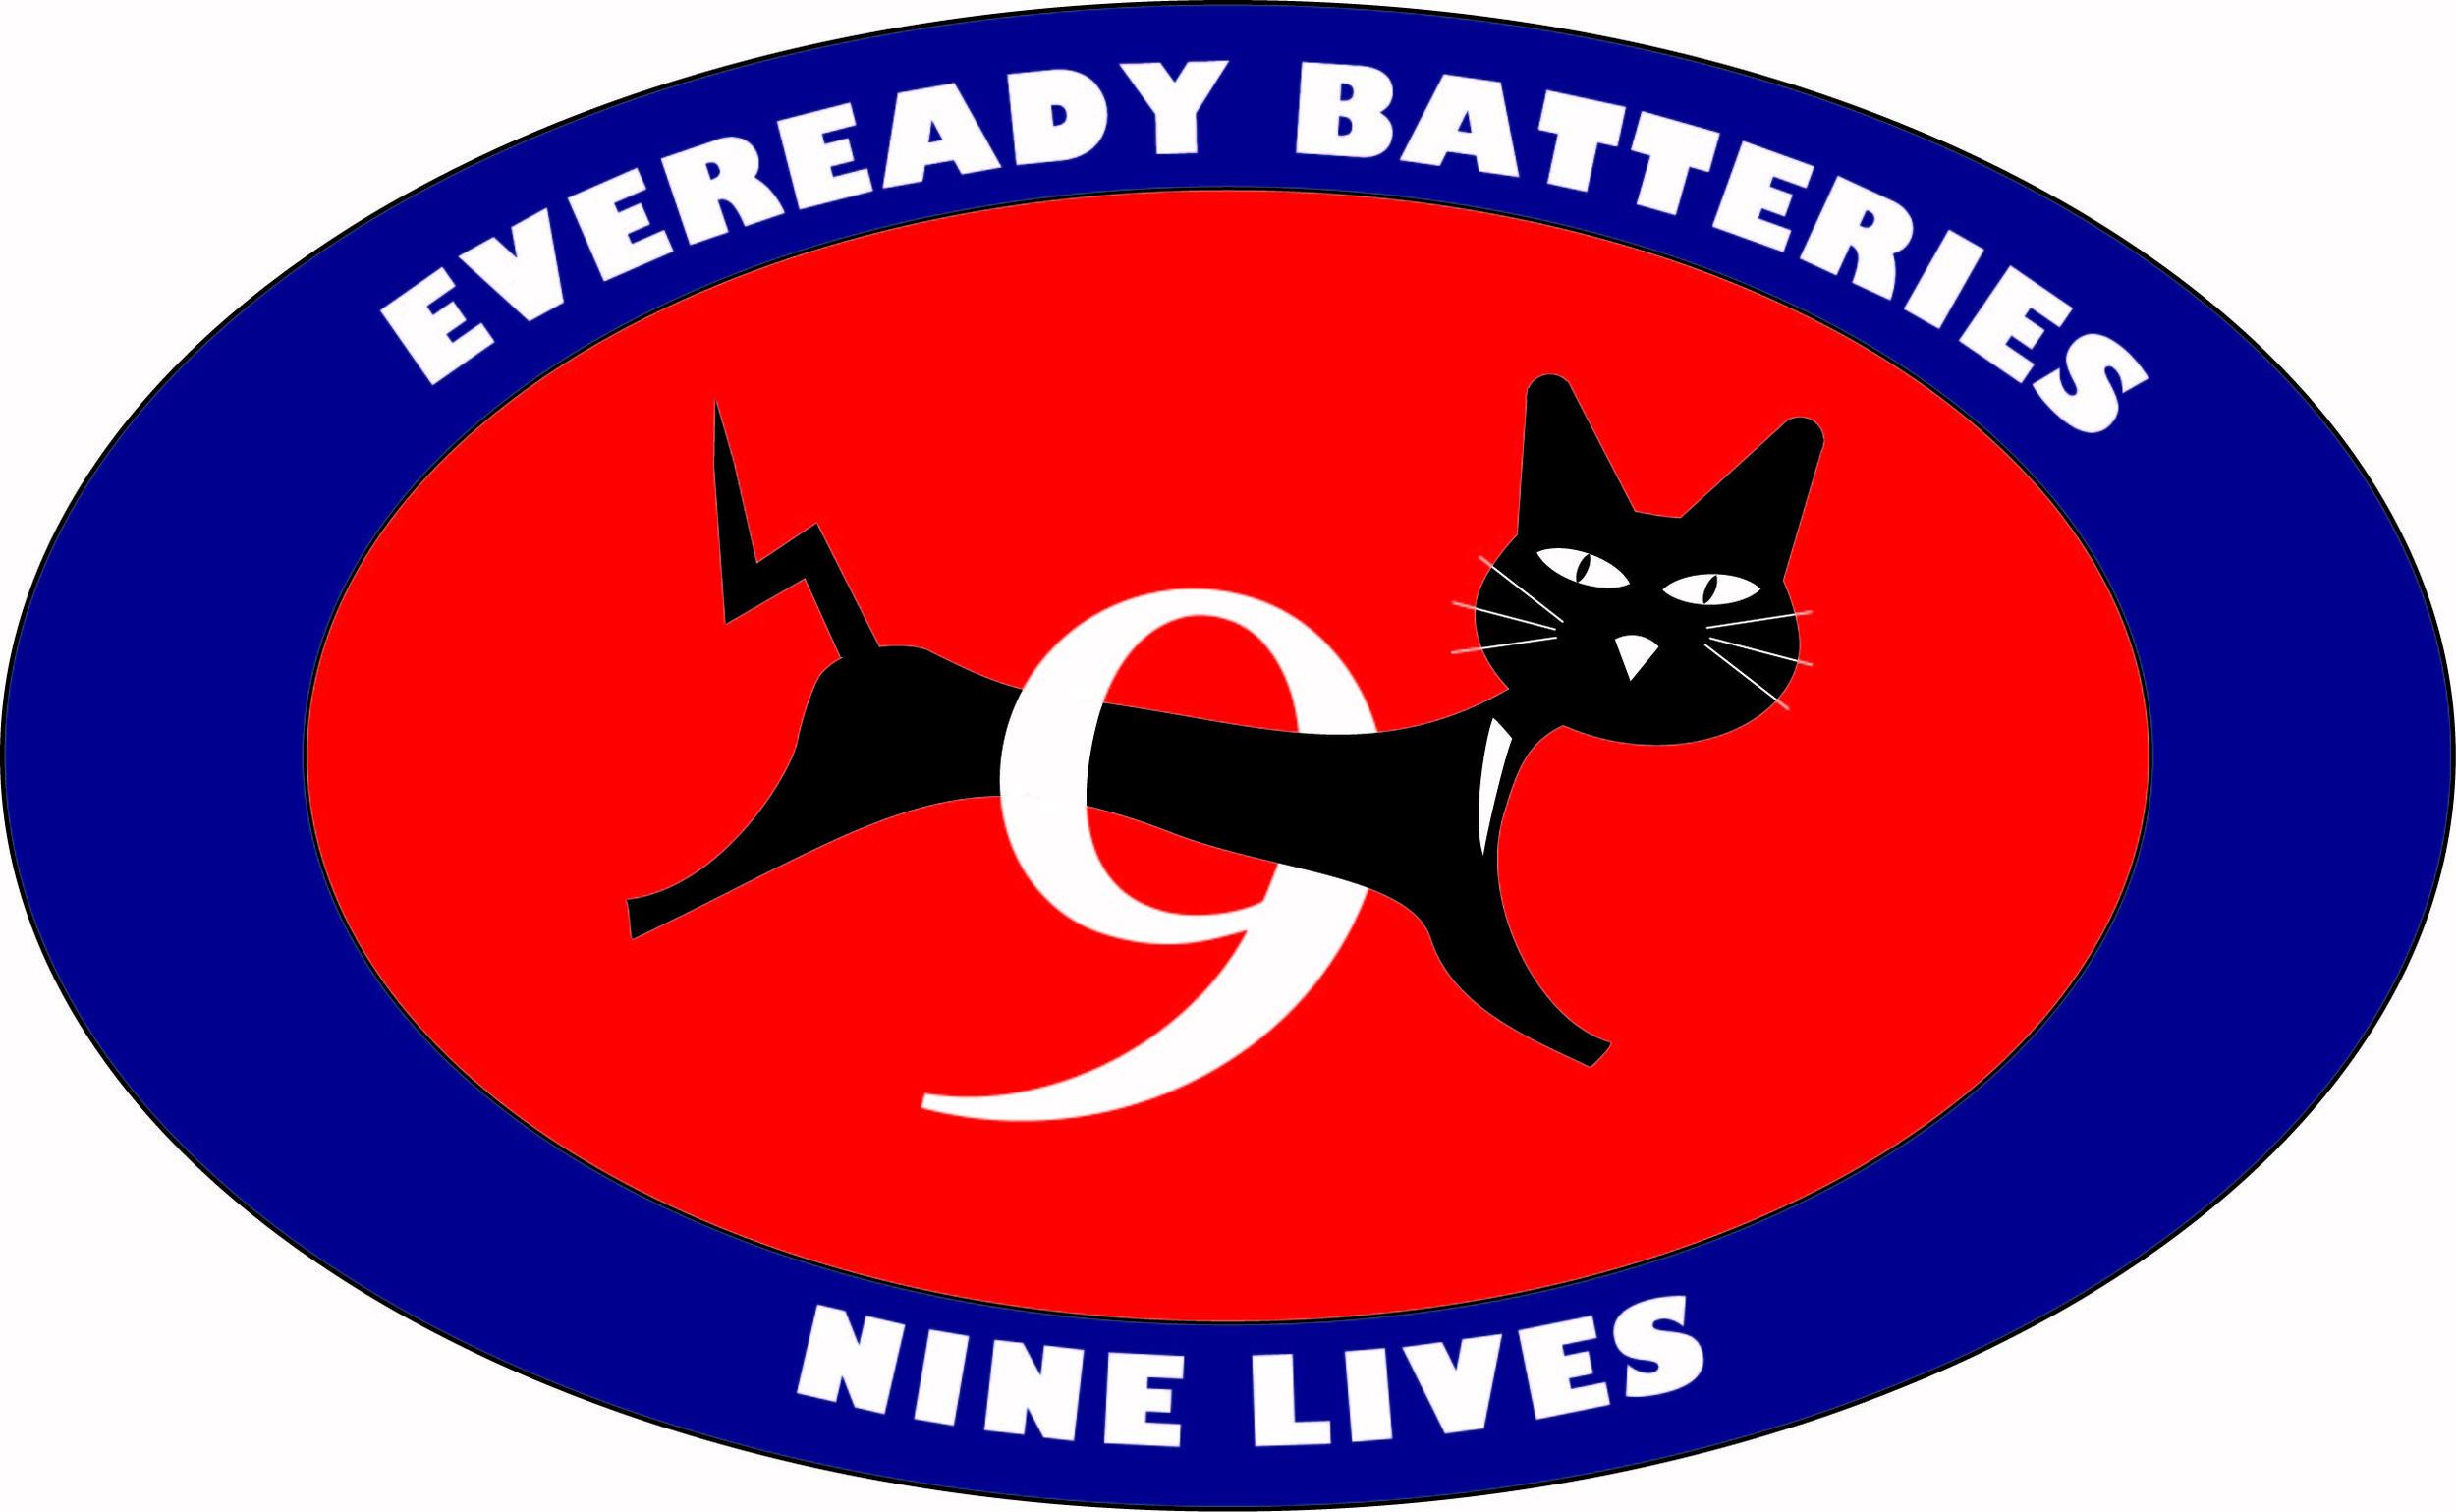 eb_cat_logo.jpg